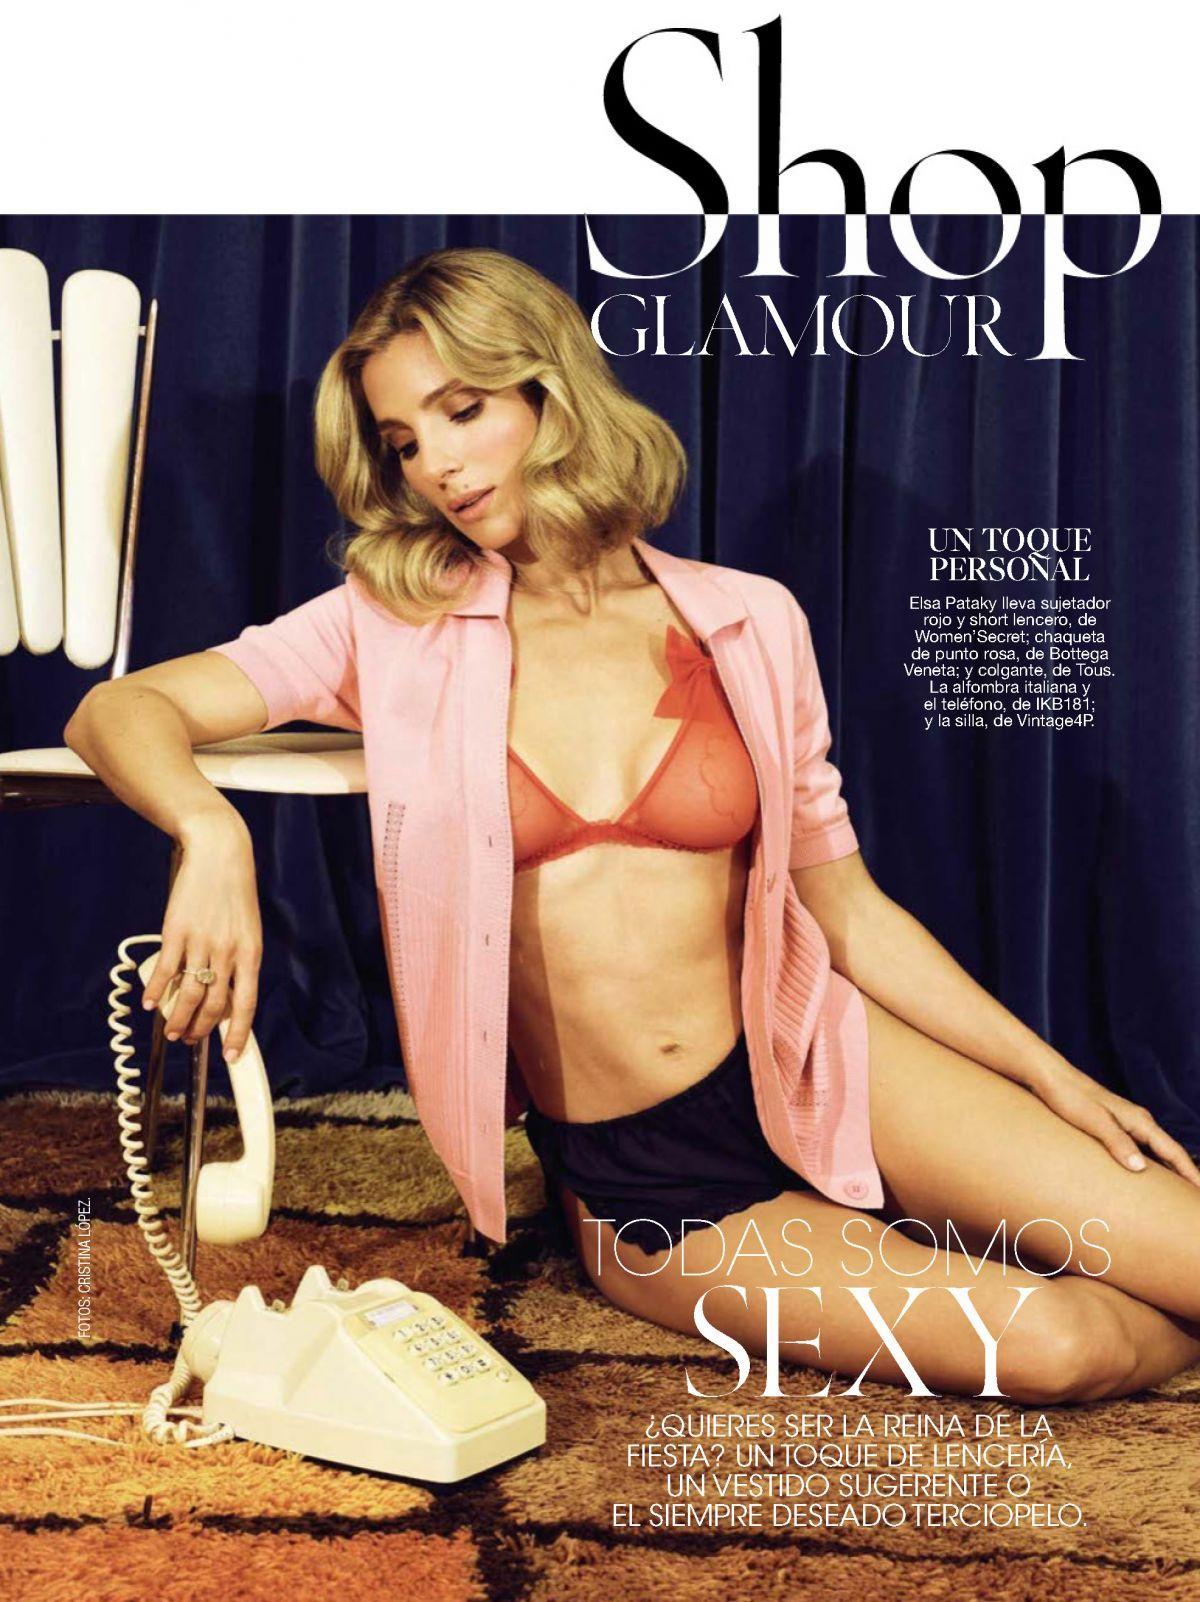 Erotica Elsa Pataky nudes (67 photos), Sexy, Fappening, Twitter, cameltoe 2015